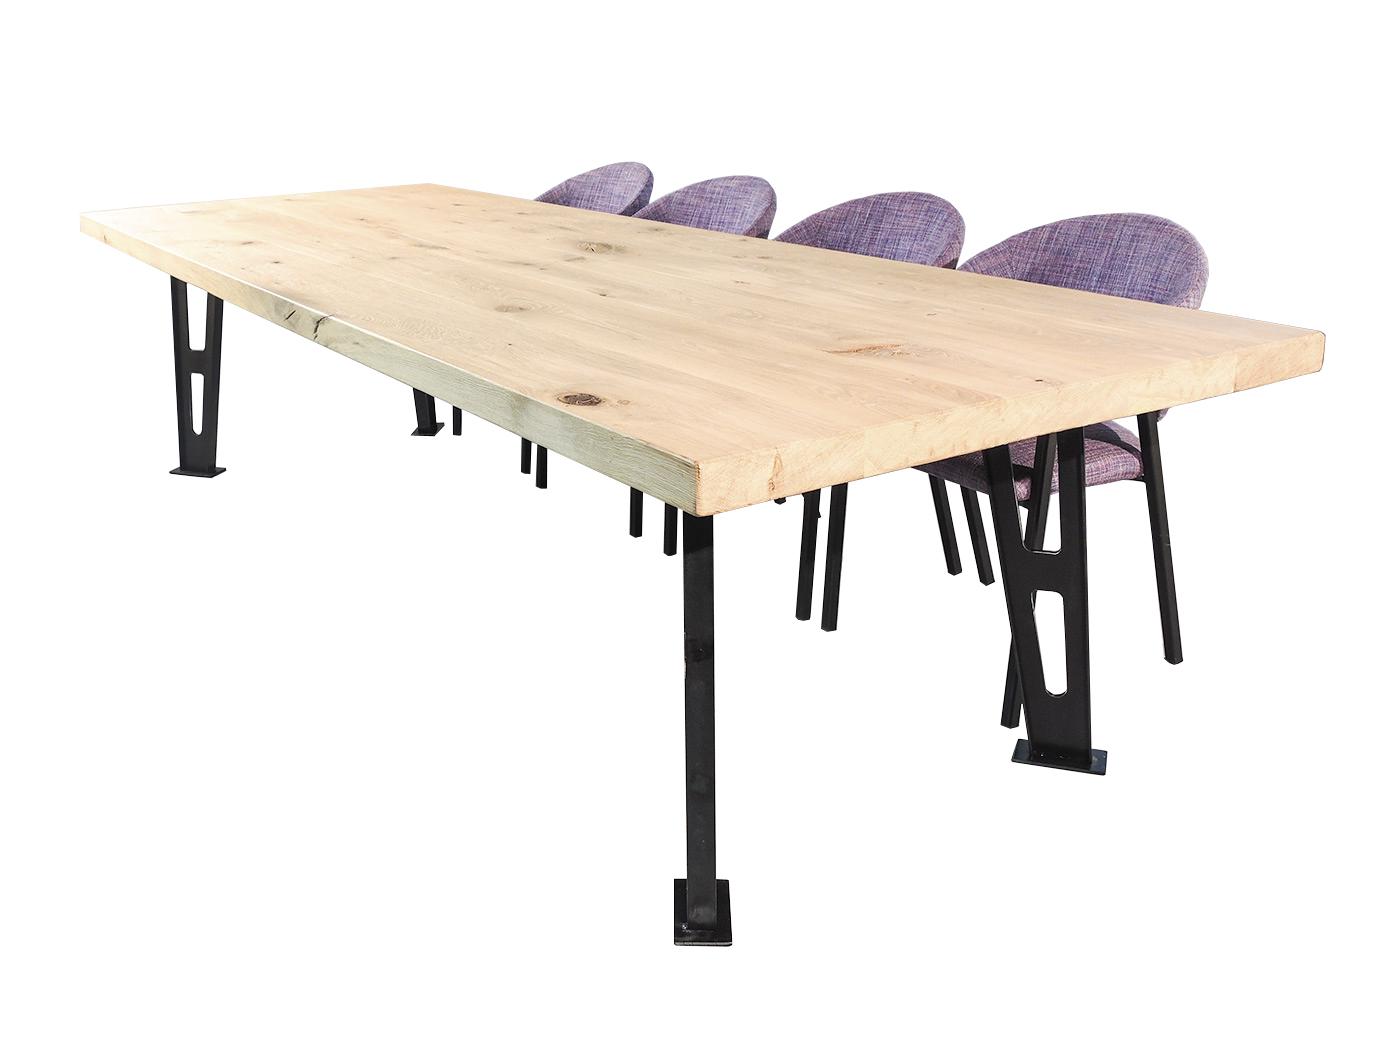 Hudson - Eettafel 10 personen